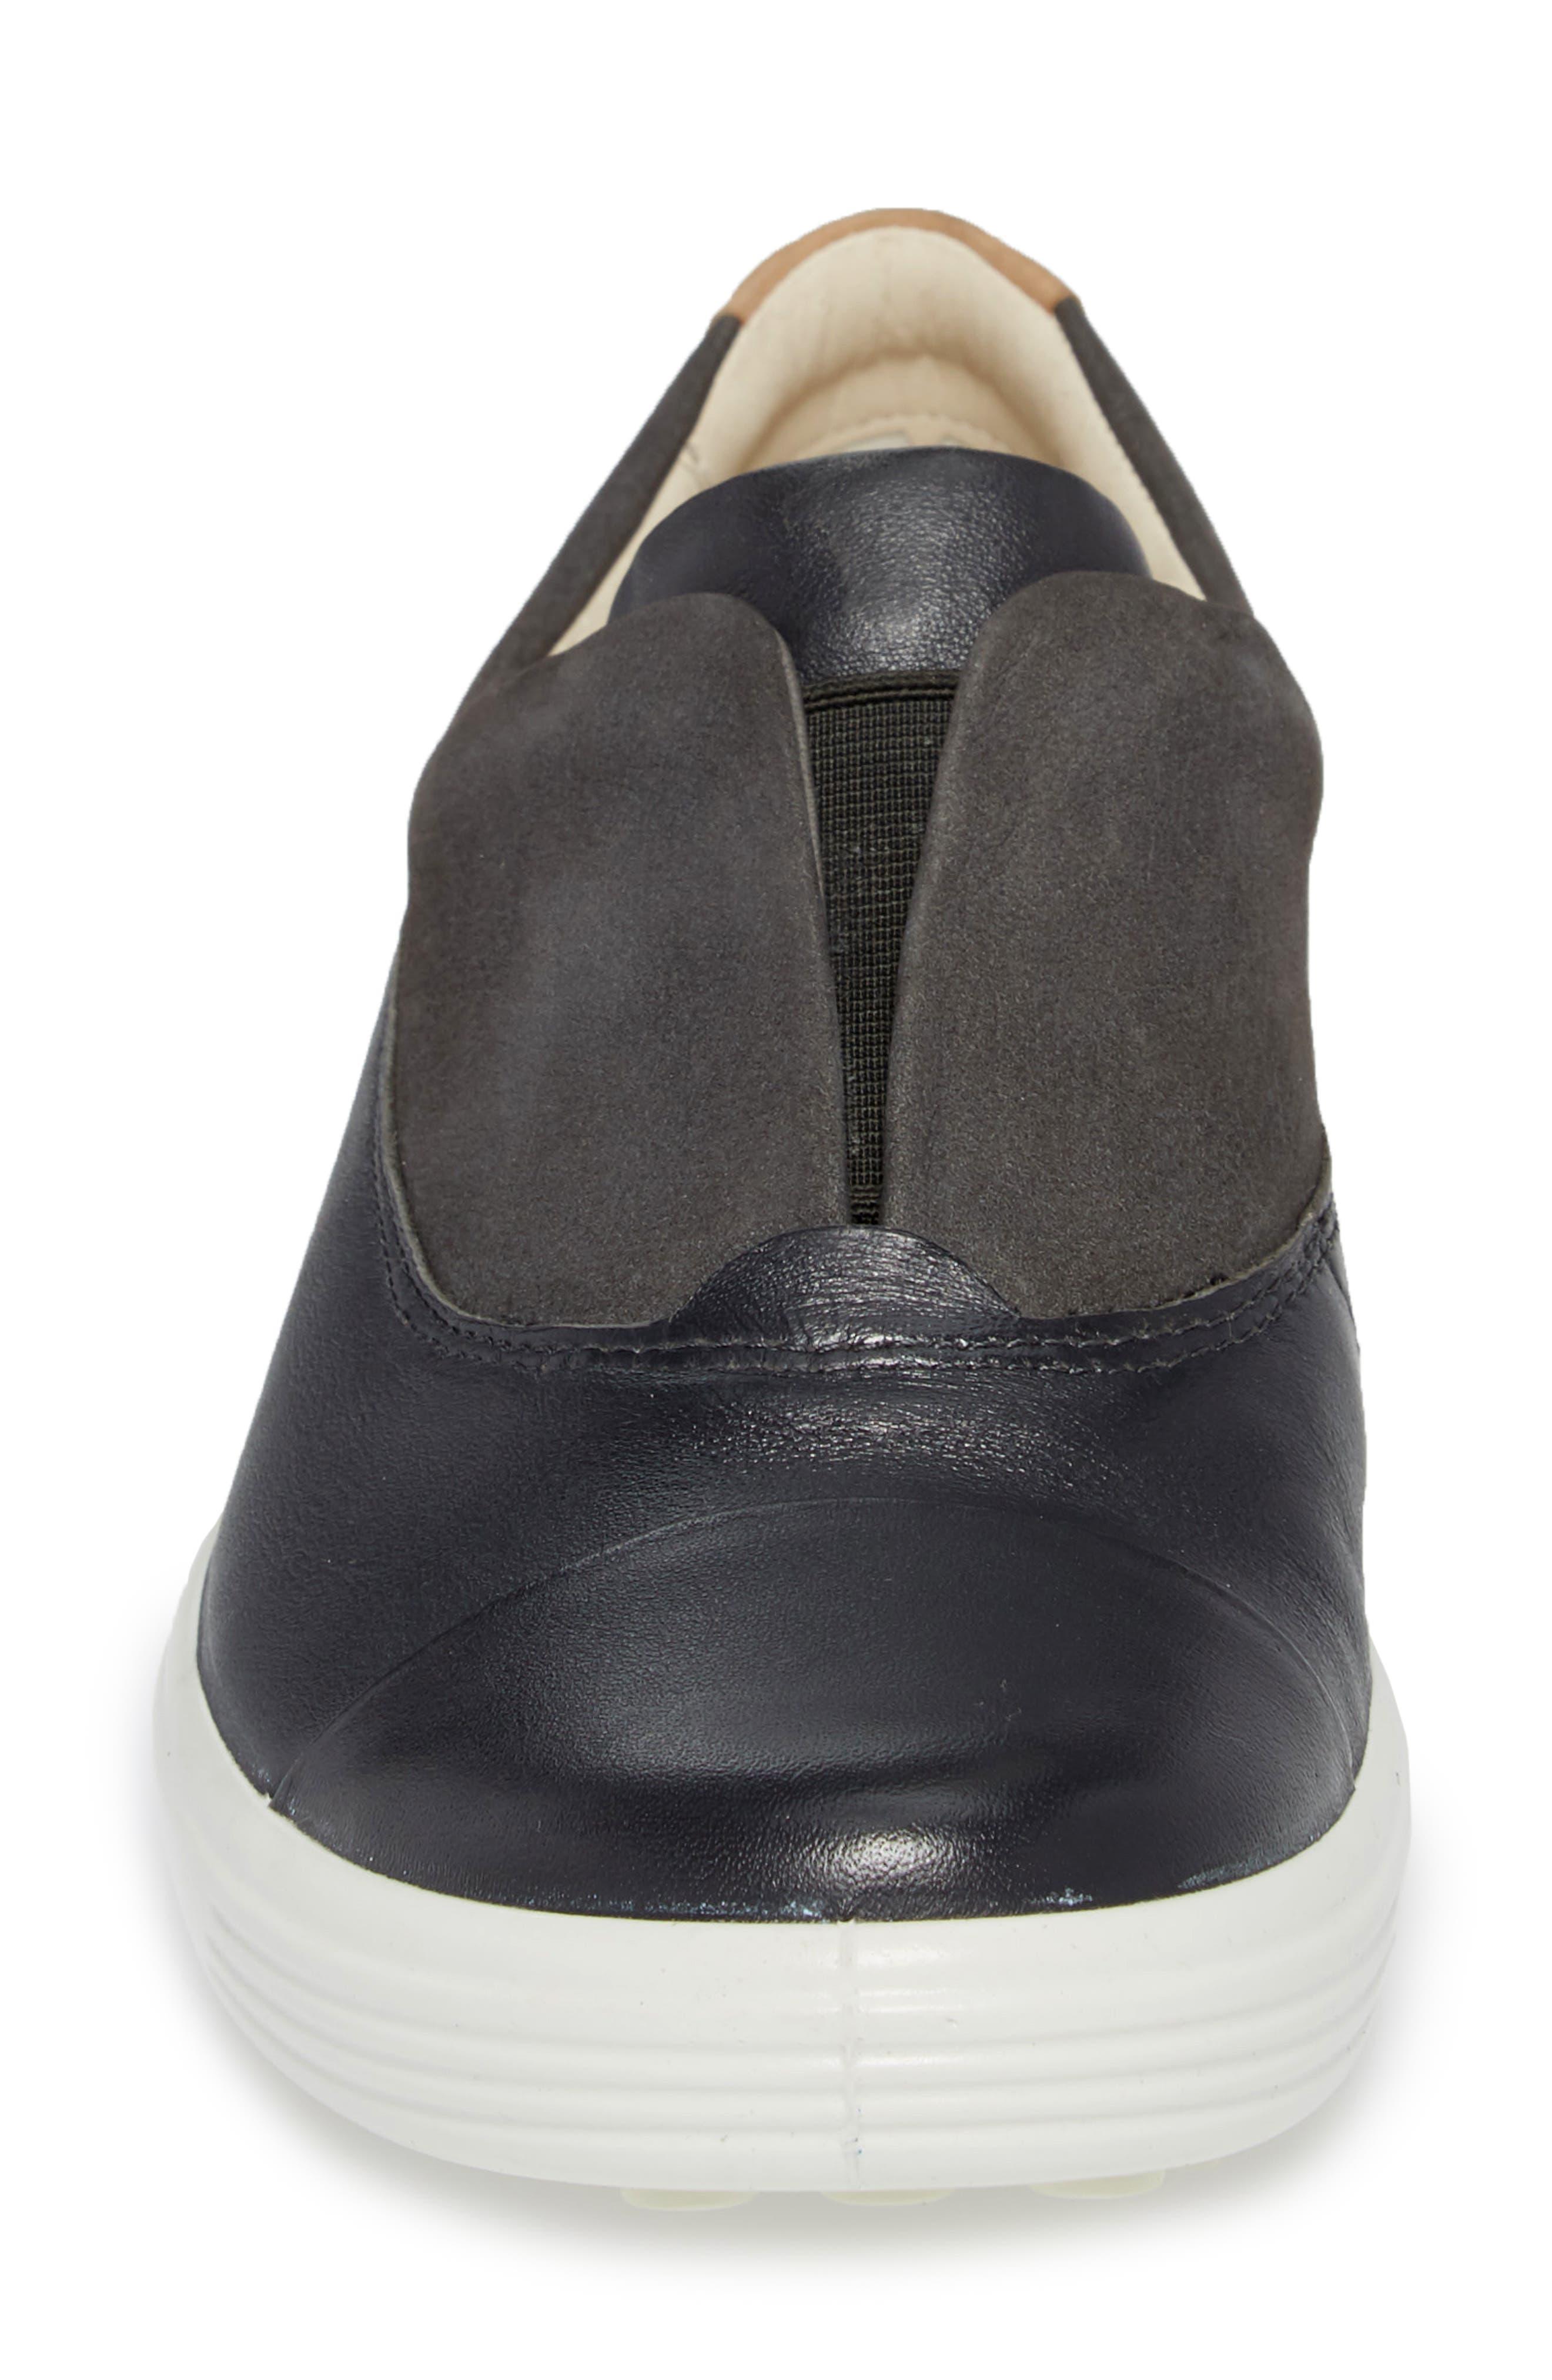 Soft 7 II Slip-On Sneaker,                             Alternate thumbnail 4, color,                             DARK SHADOW LEATHER